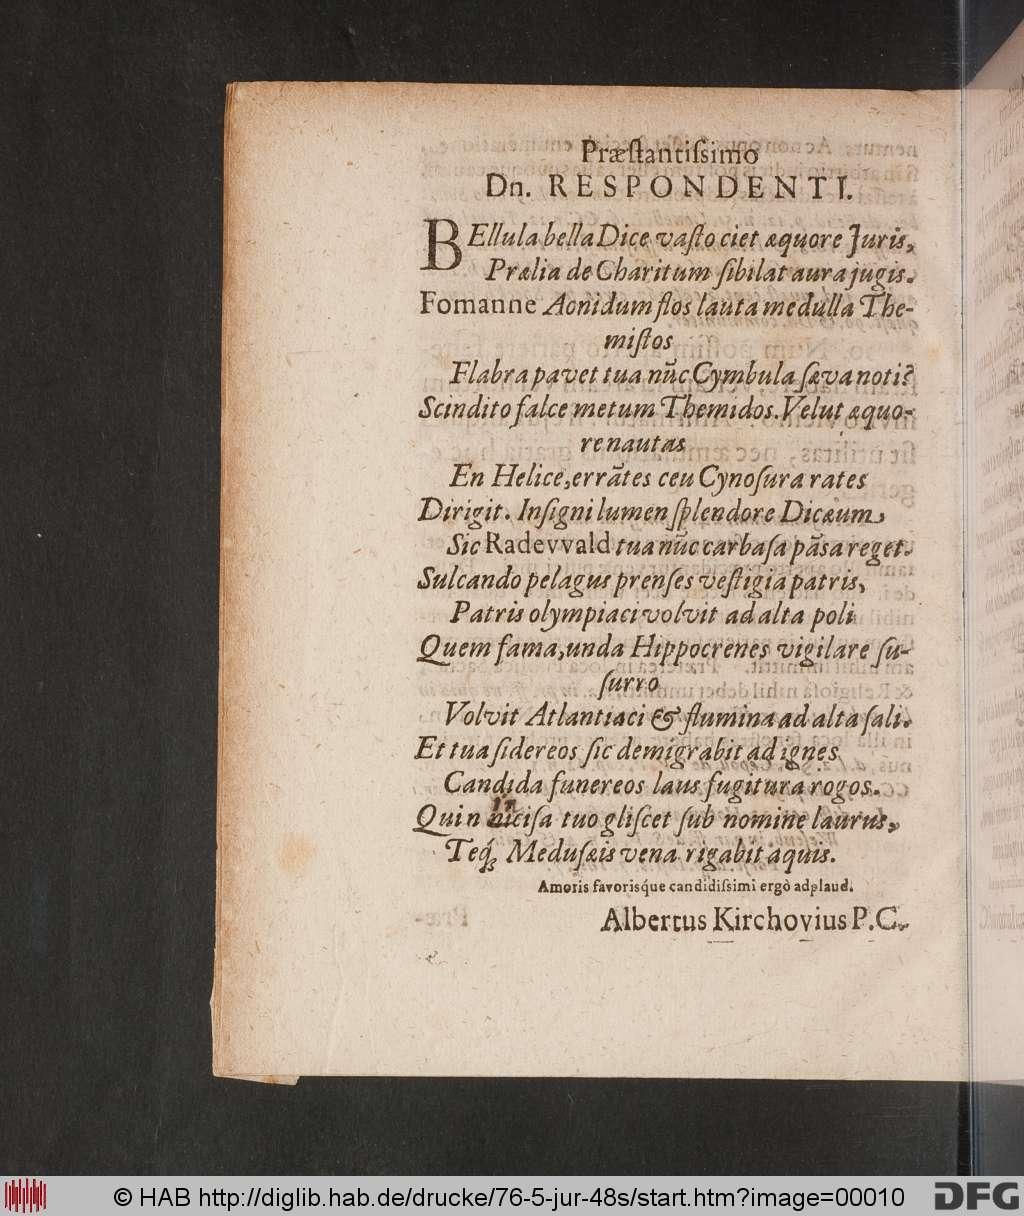 http://diglib.hab.de/drucke/76-5-jur-48s/00010.jpg